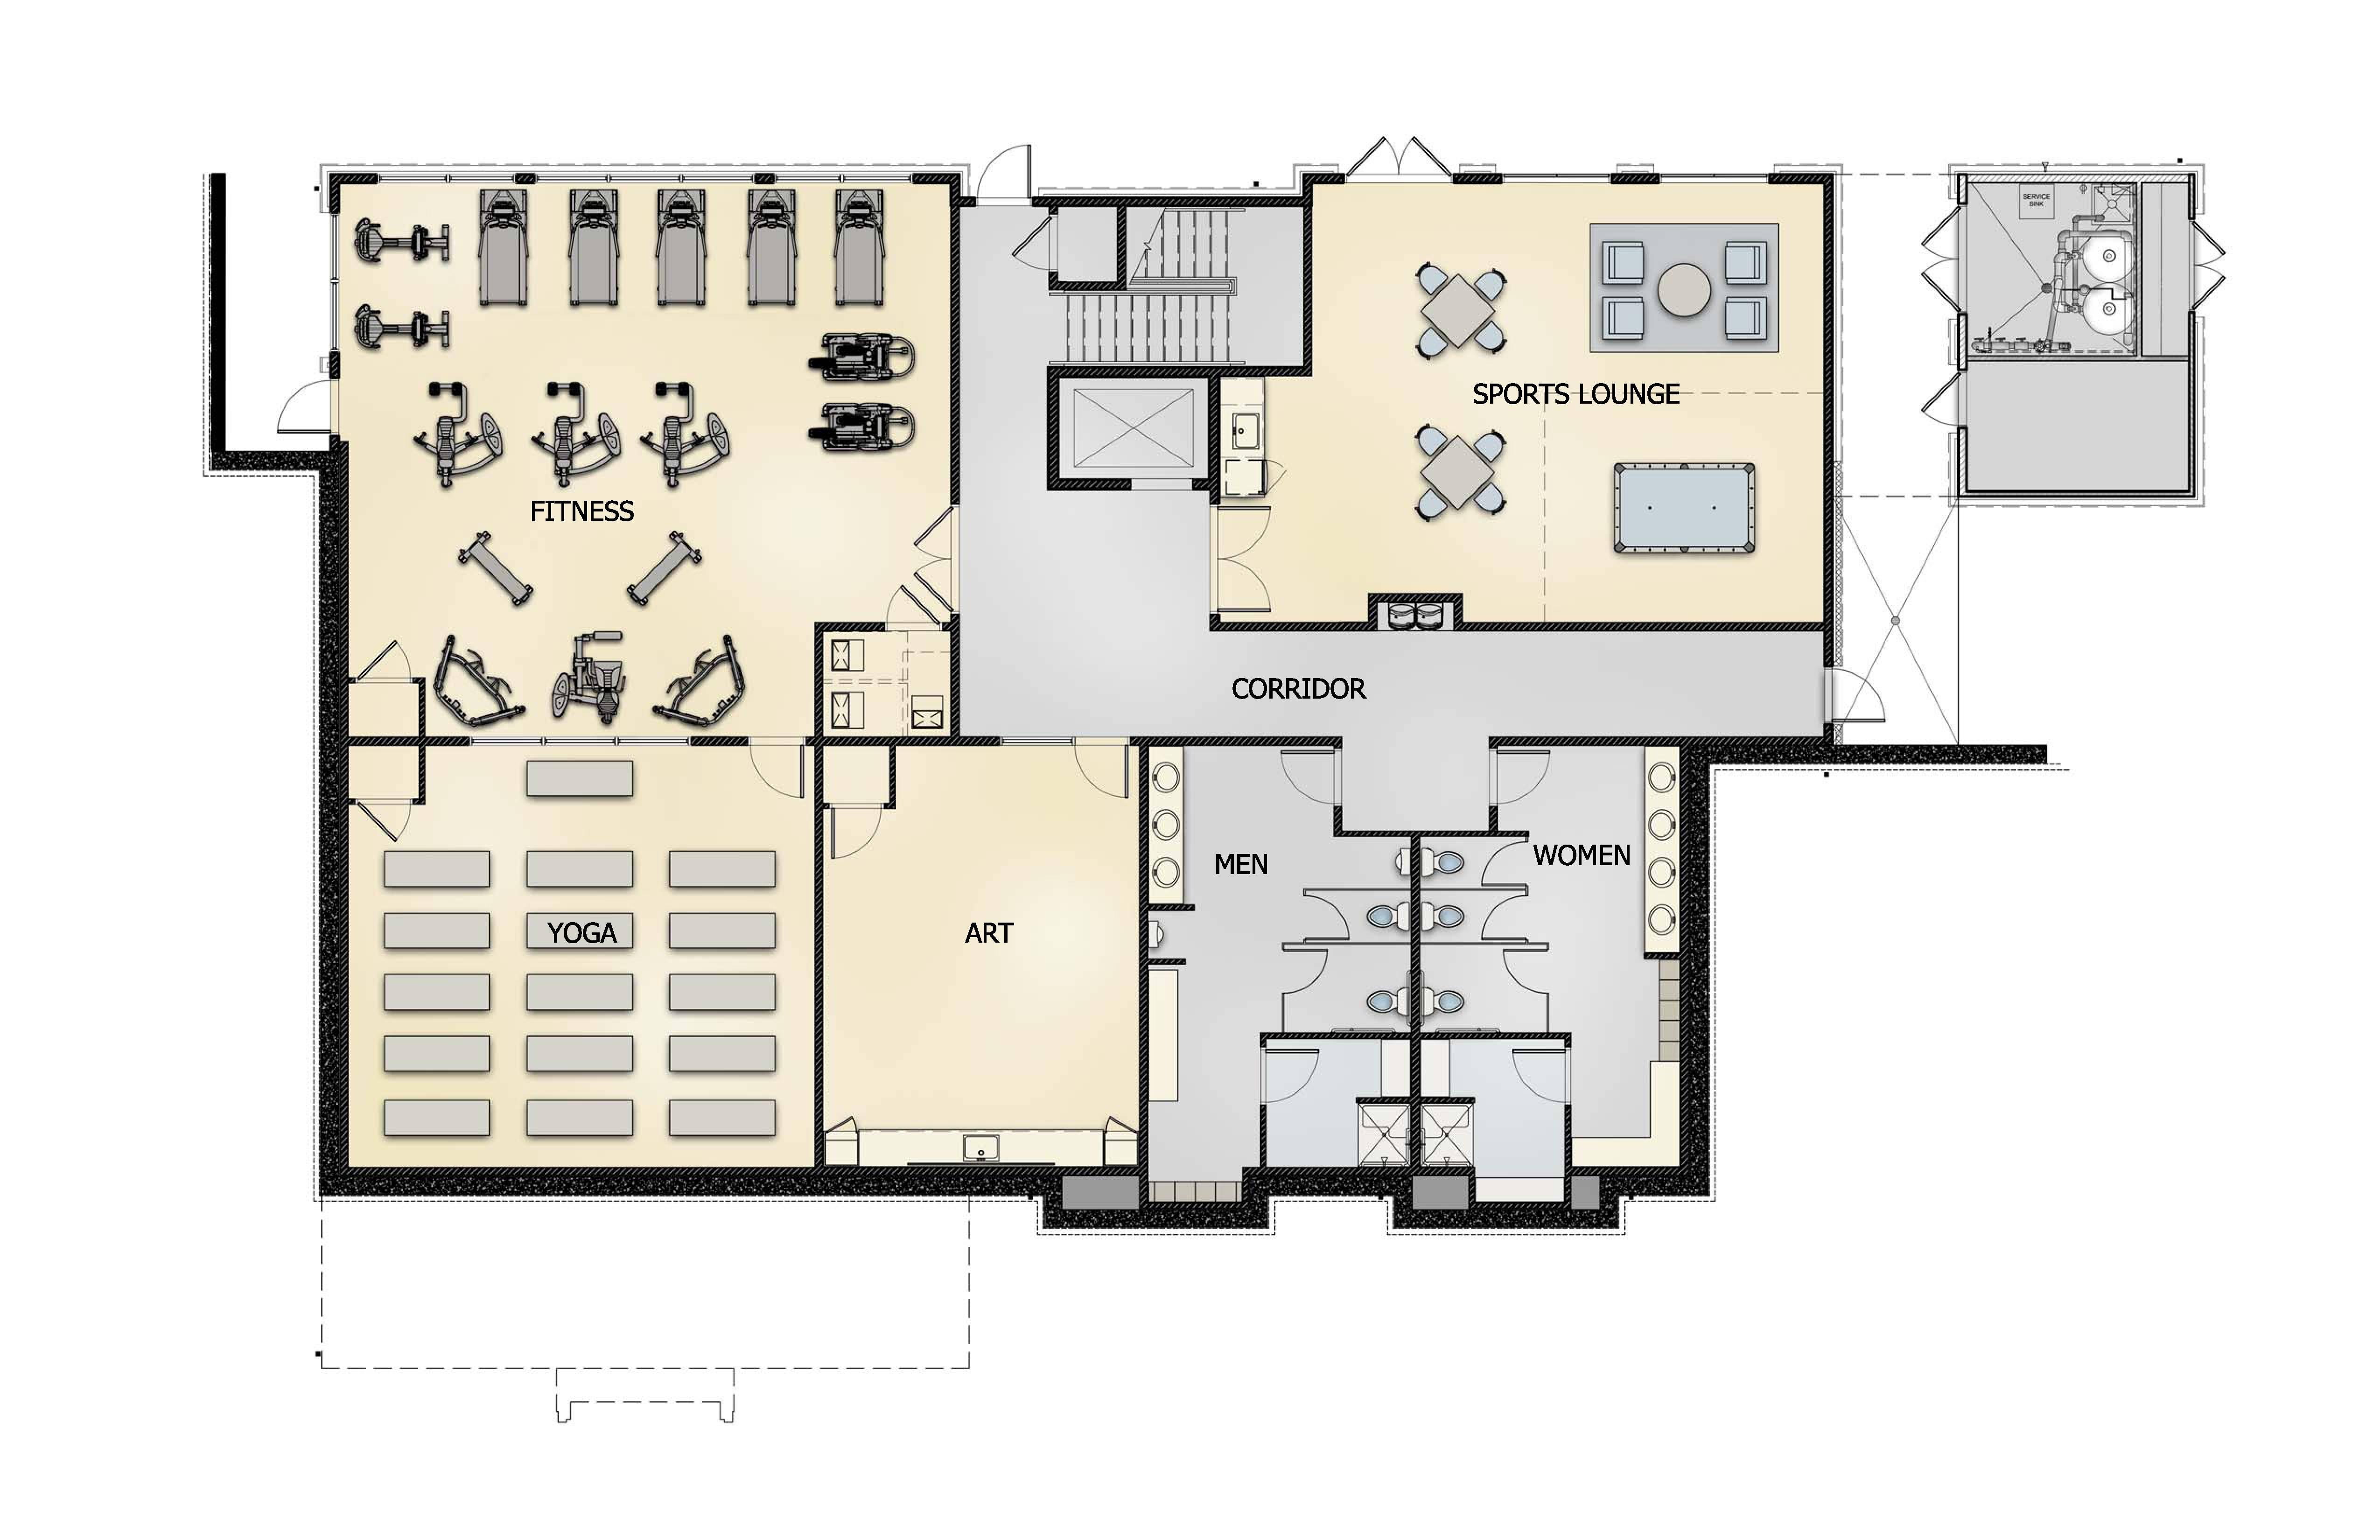 The Village Club lower floor